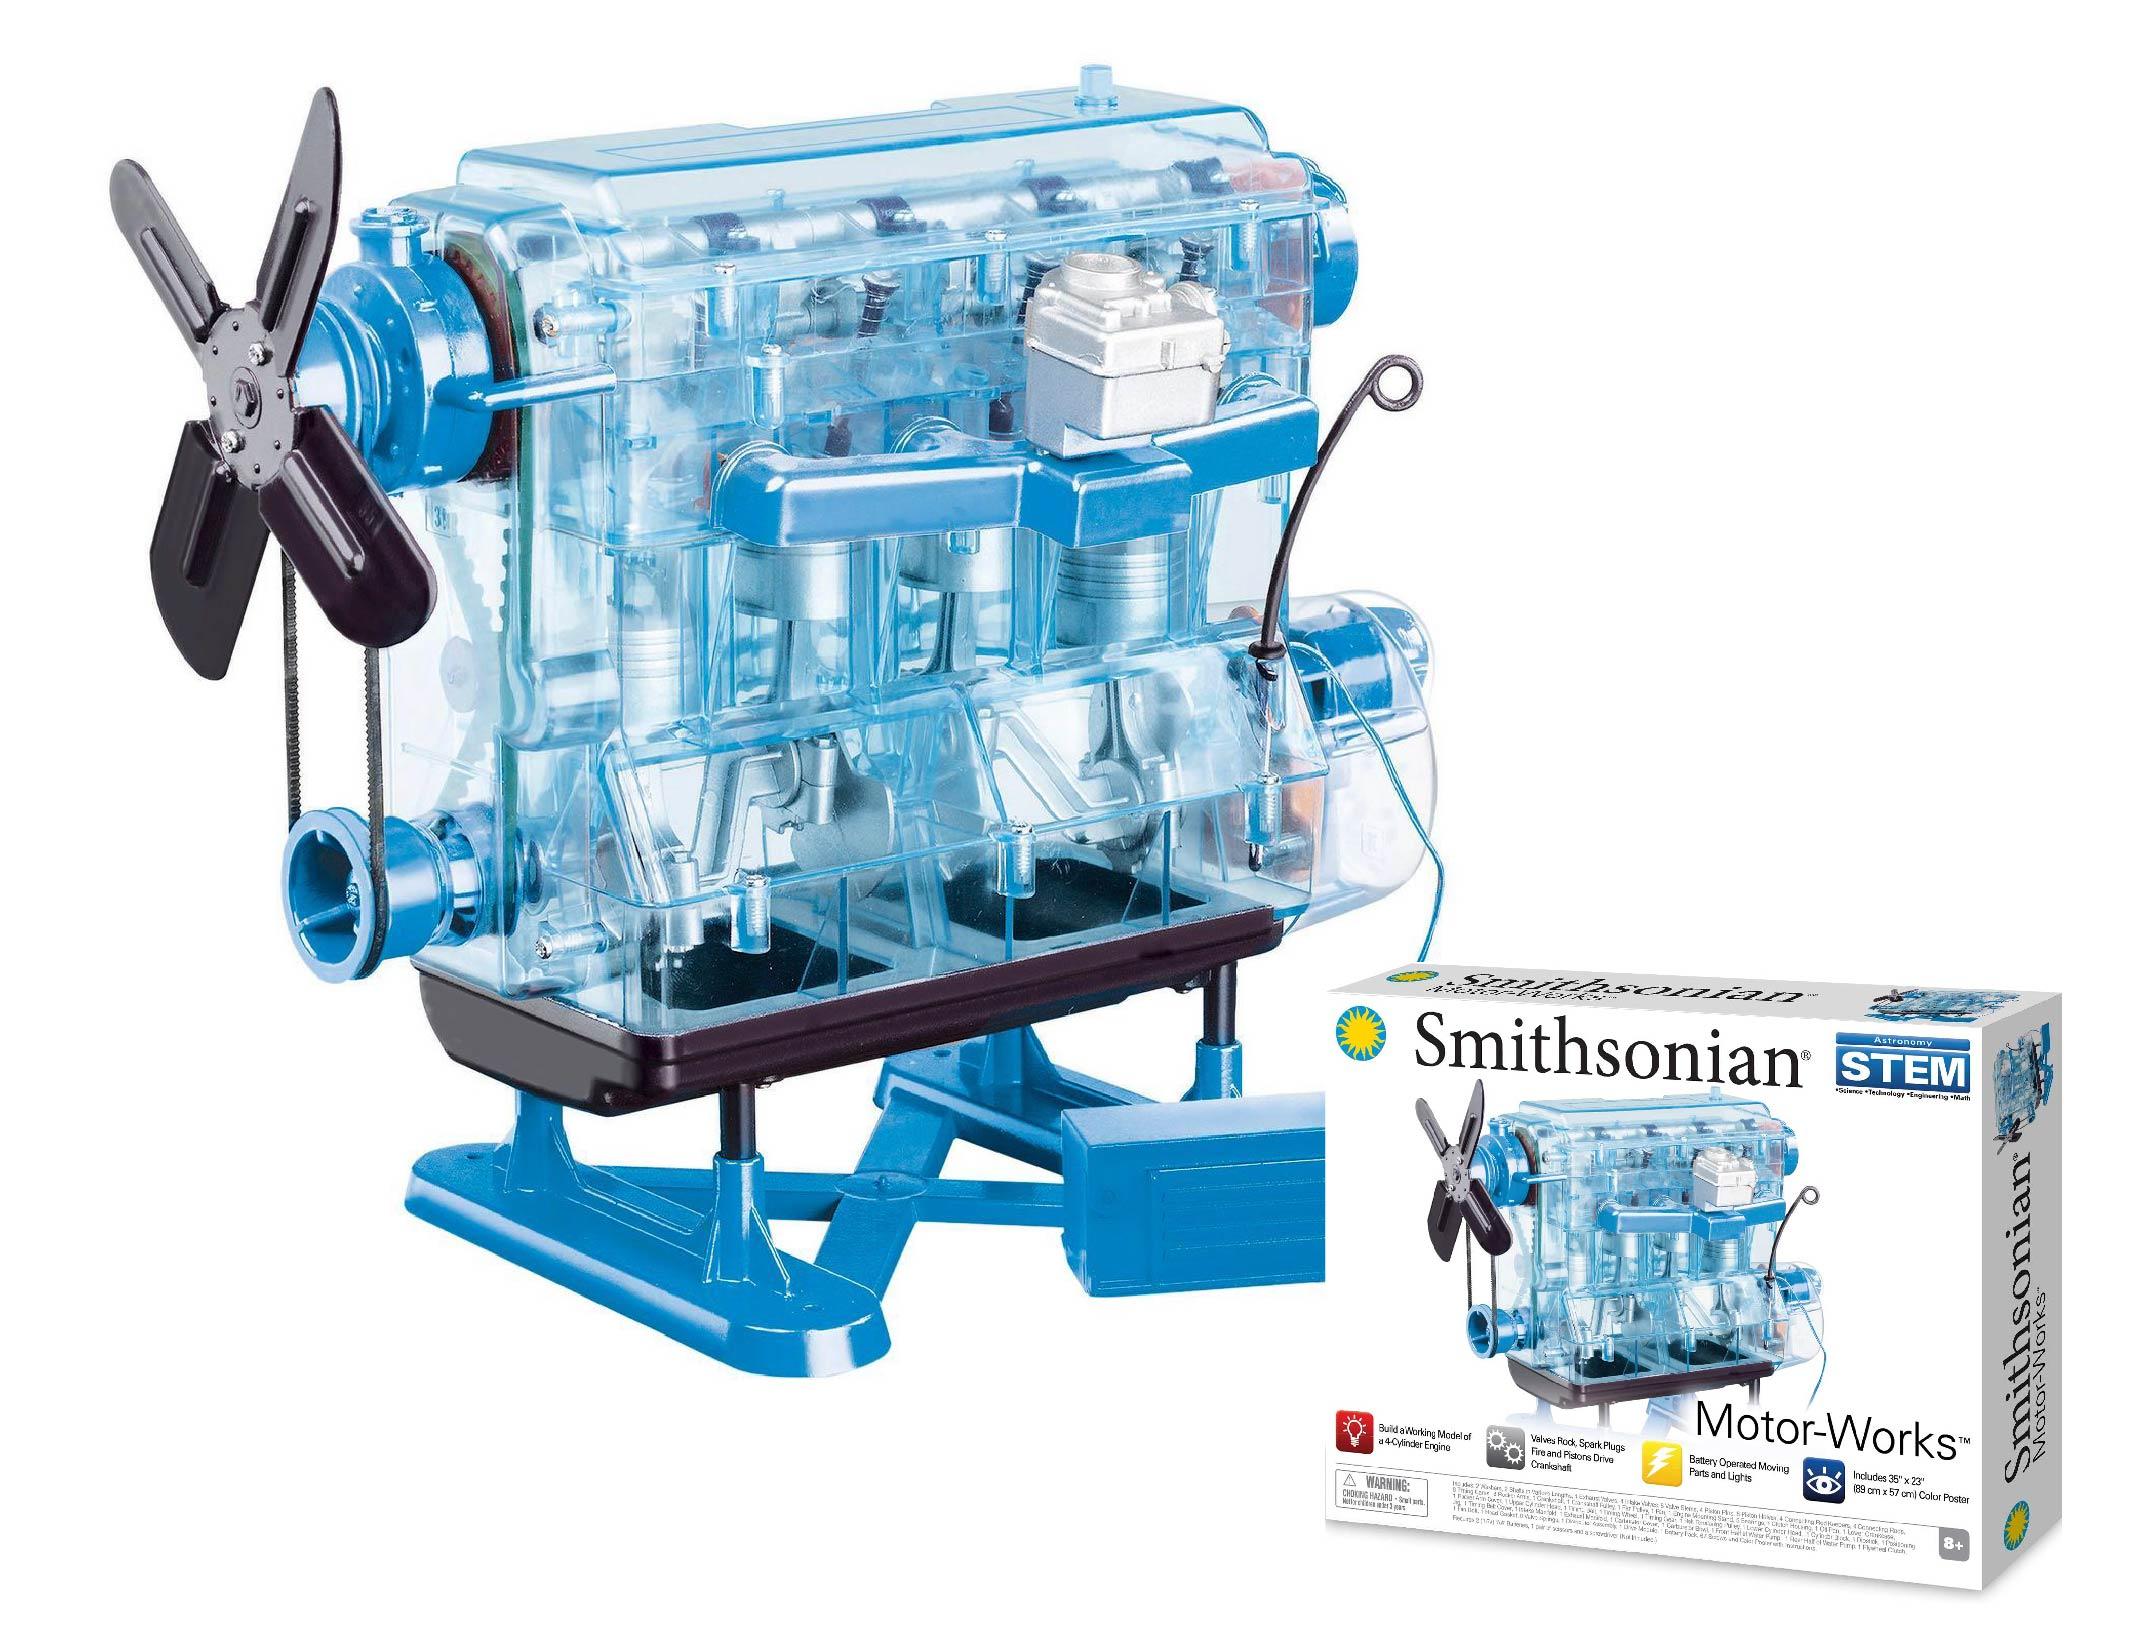 Smithsonian Motor-Works Engine Model